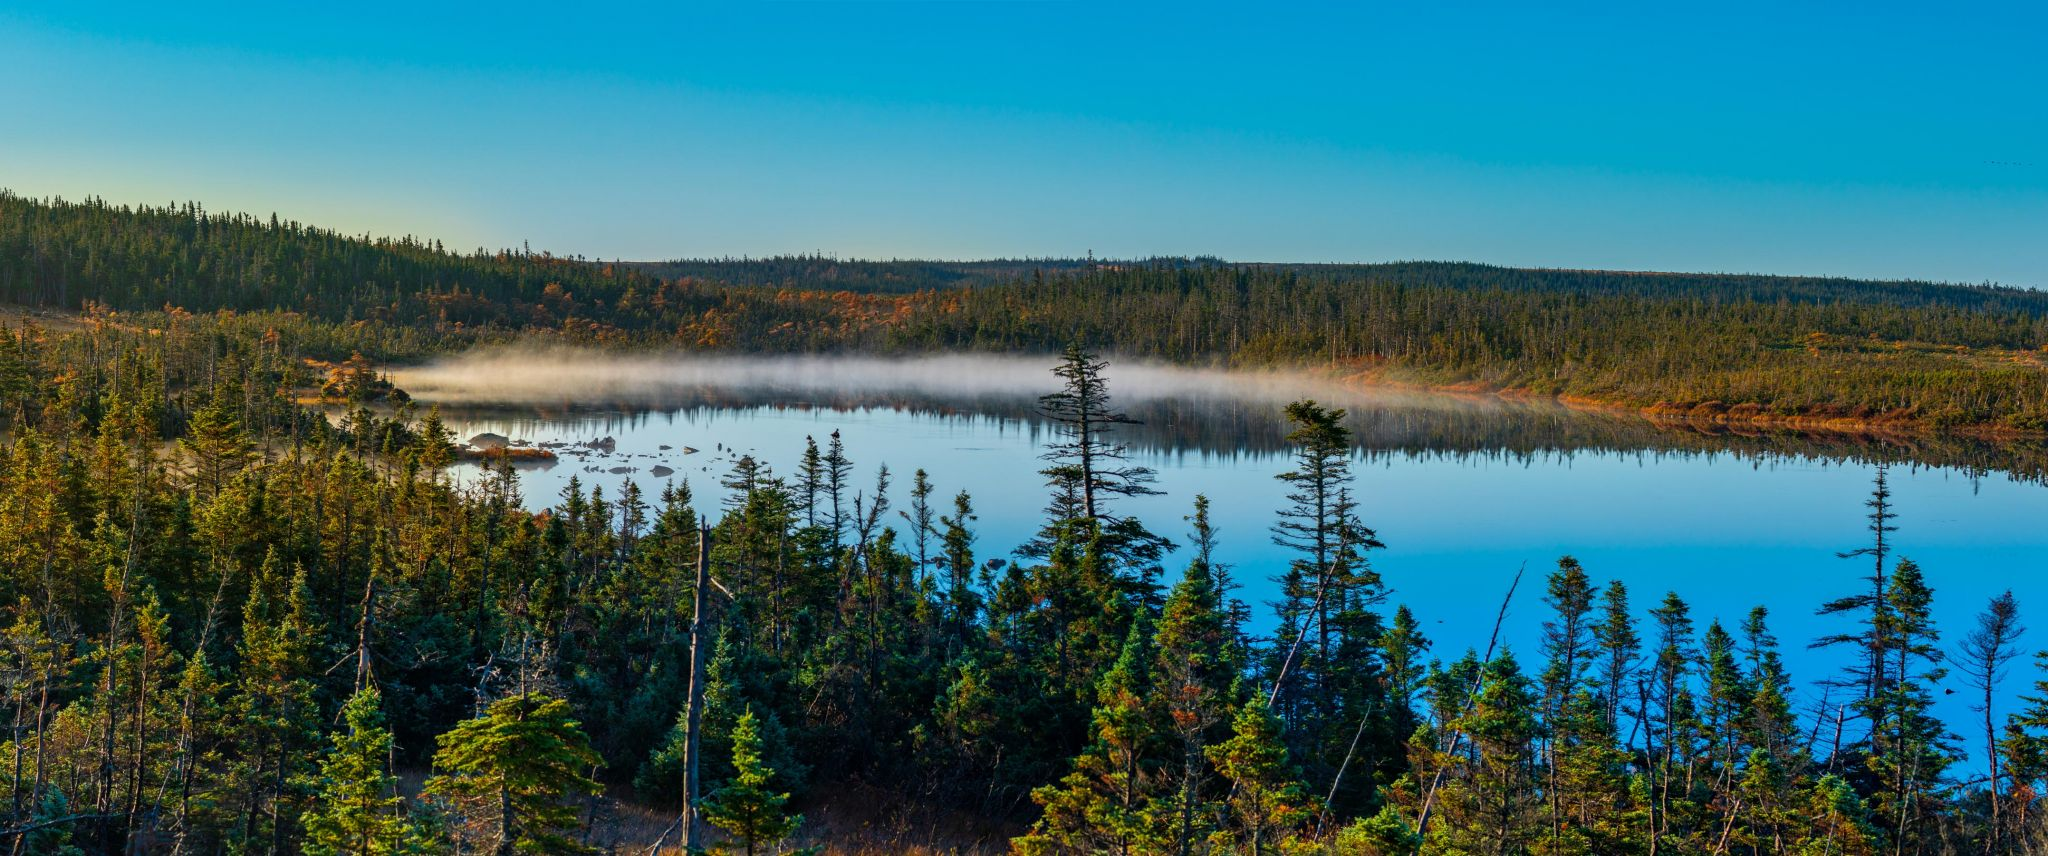 French Lake early morning mist Cape Breton Nova Scotia, Canada